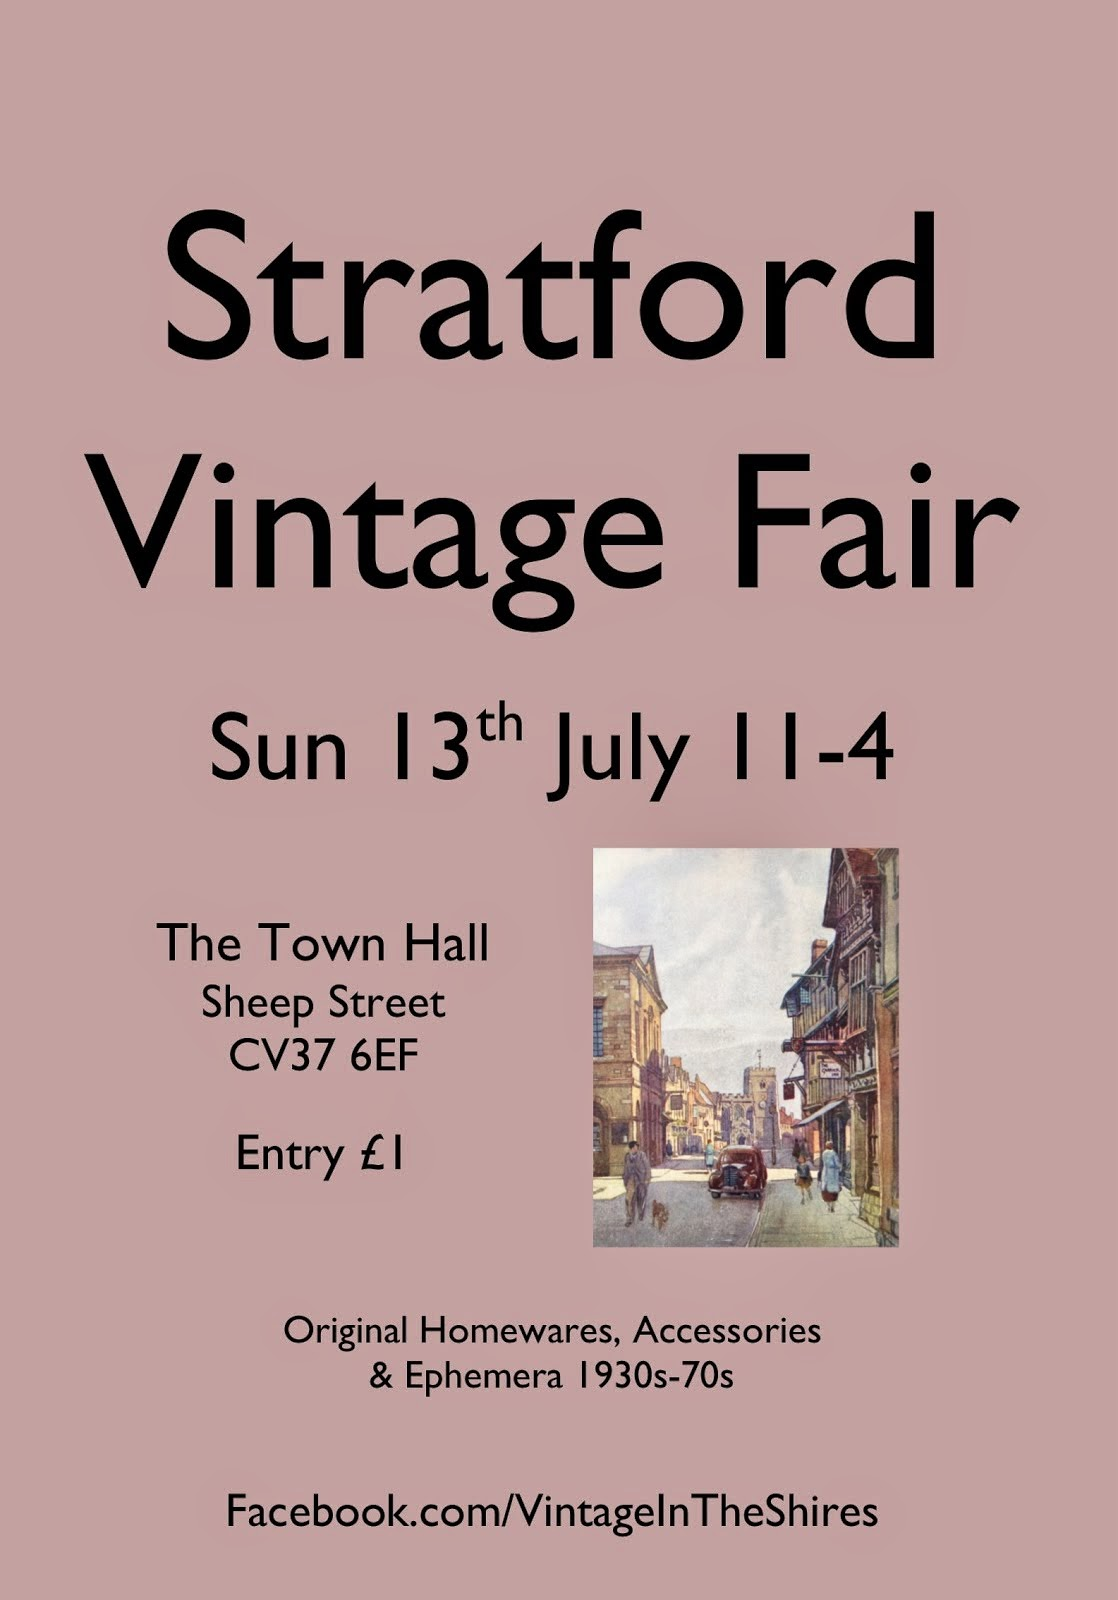 Stratford Vintage Fair